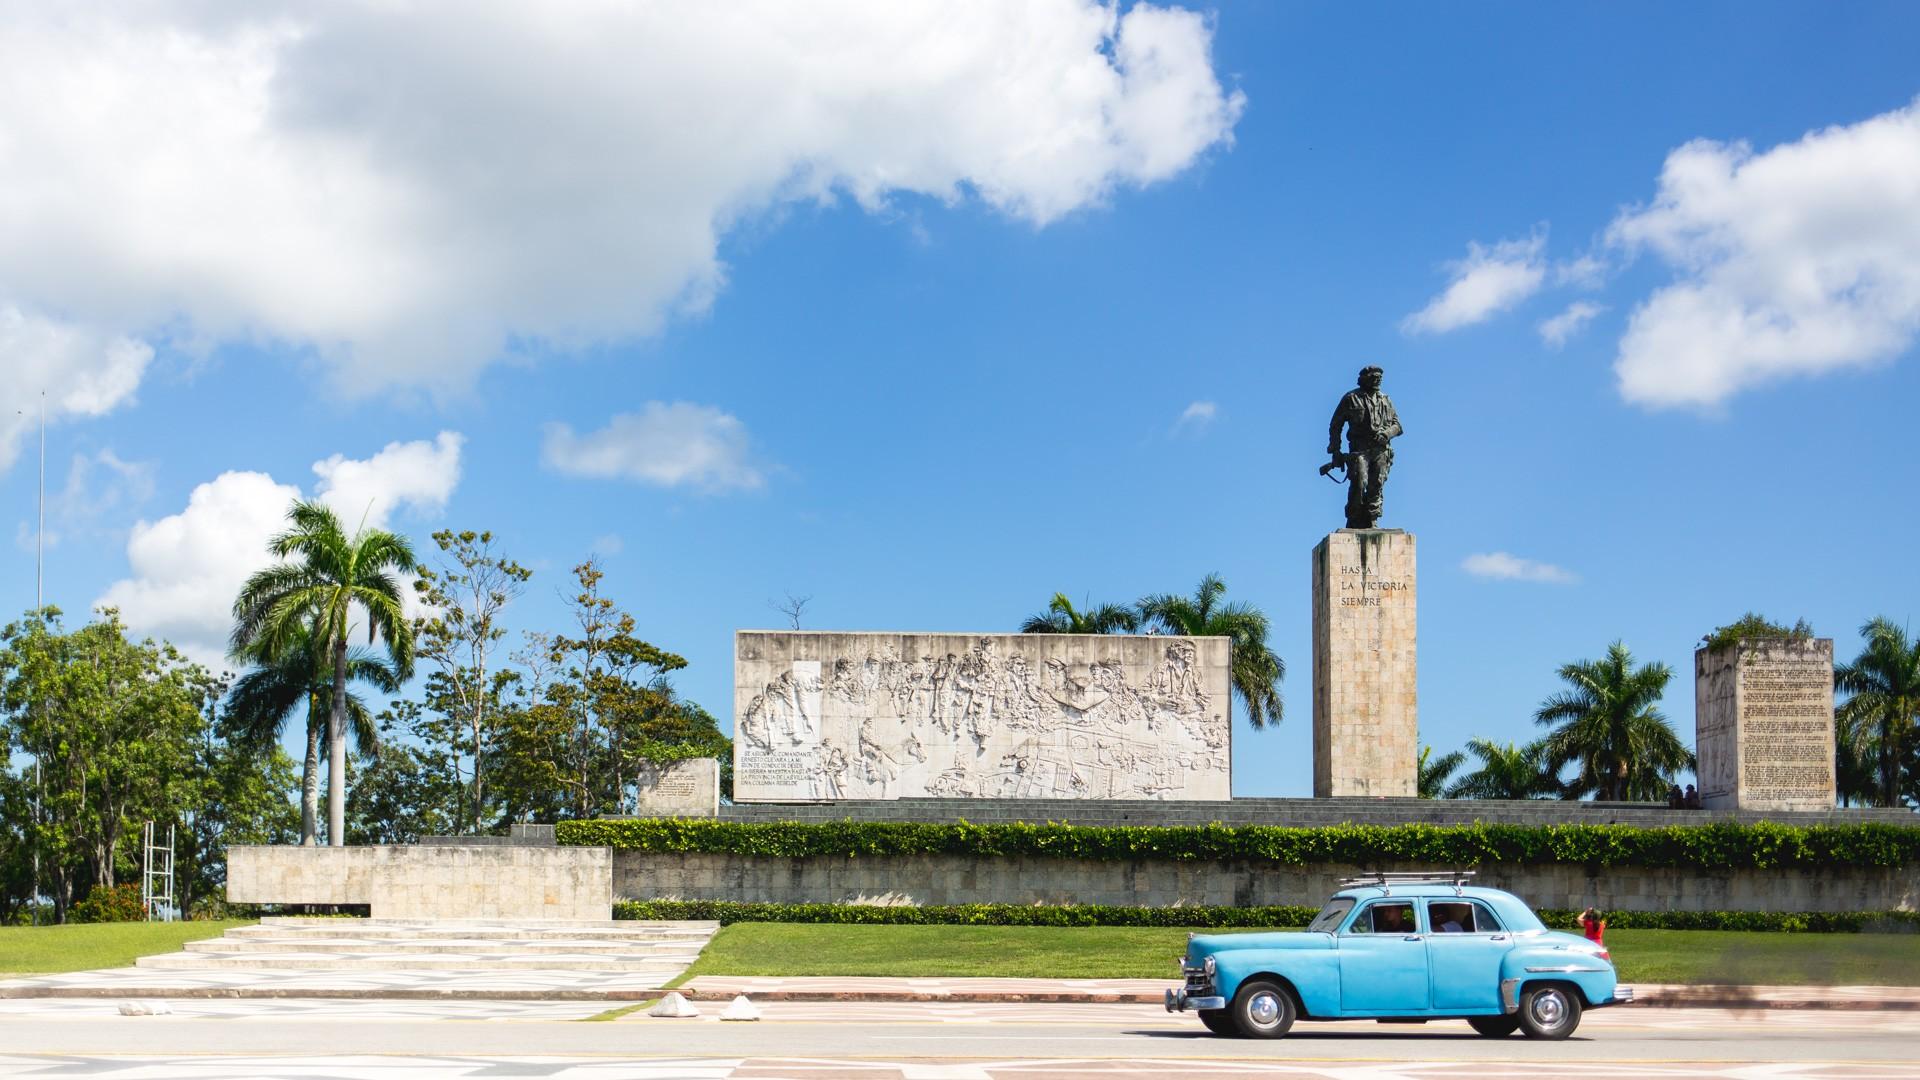 Damien-Dohmen-Photographe-Cuba-27